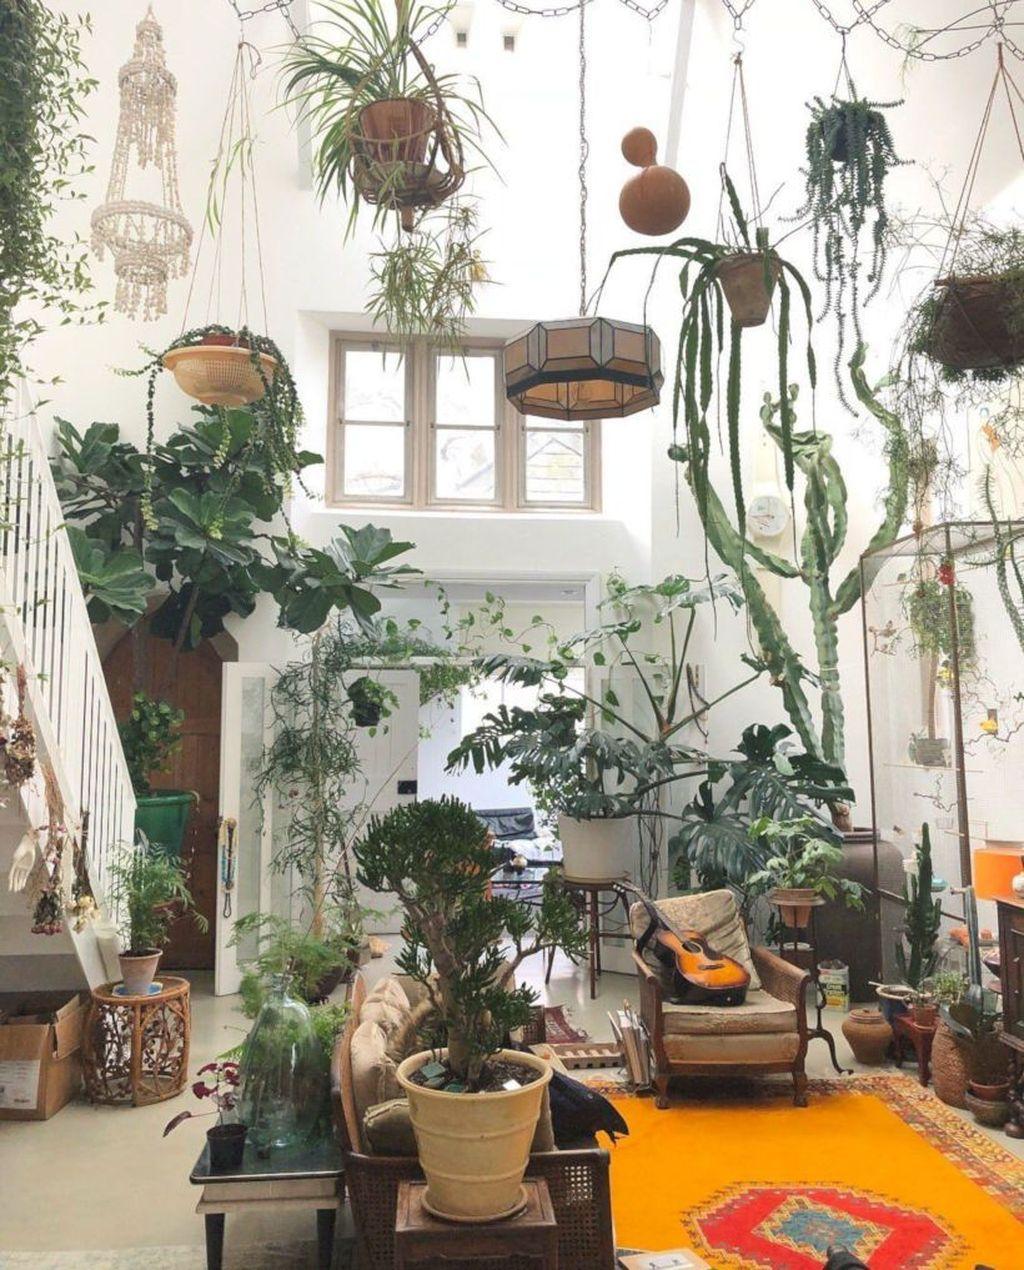 The Best Indoor Garden Ideas To Beautify Your Home 19